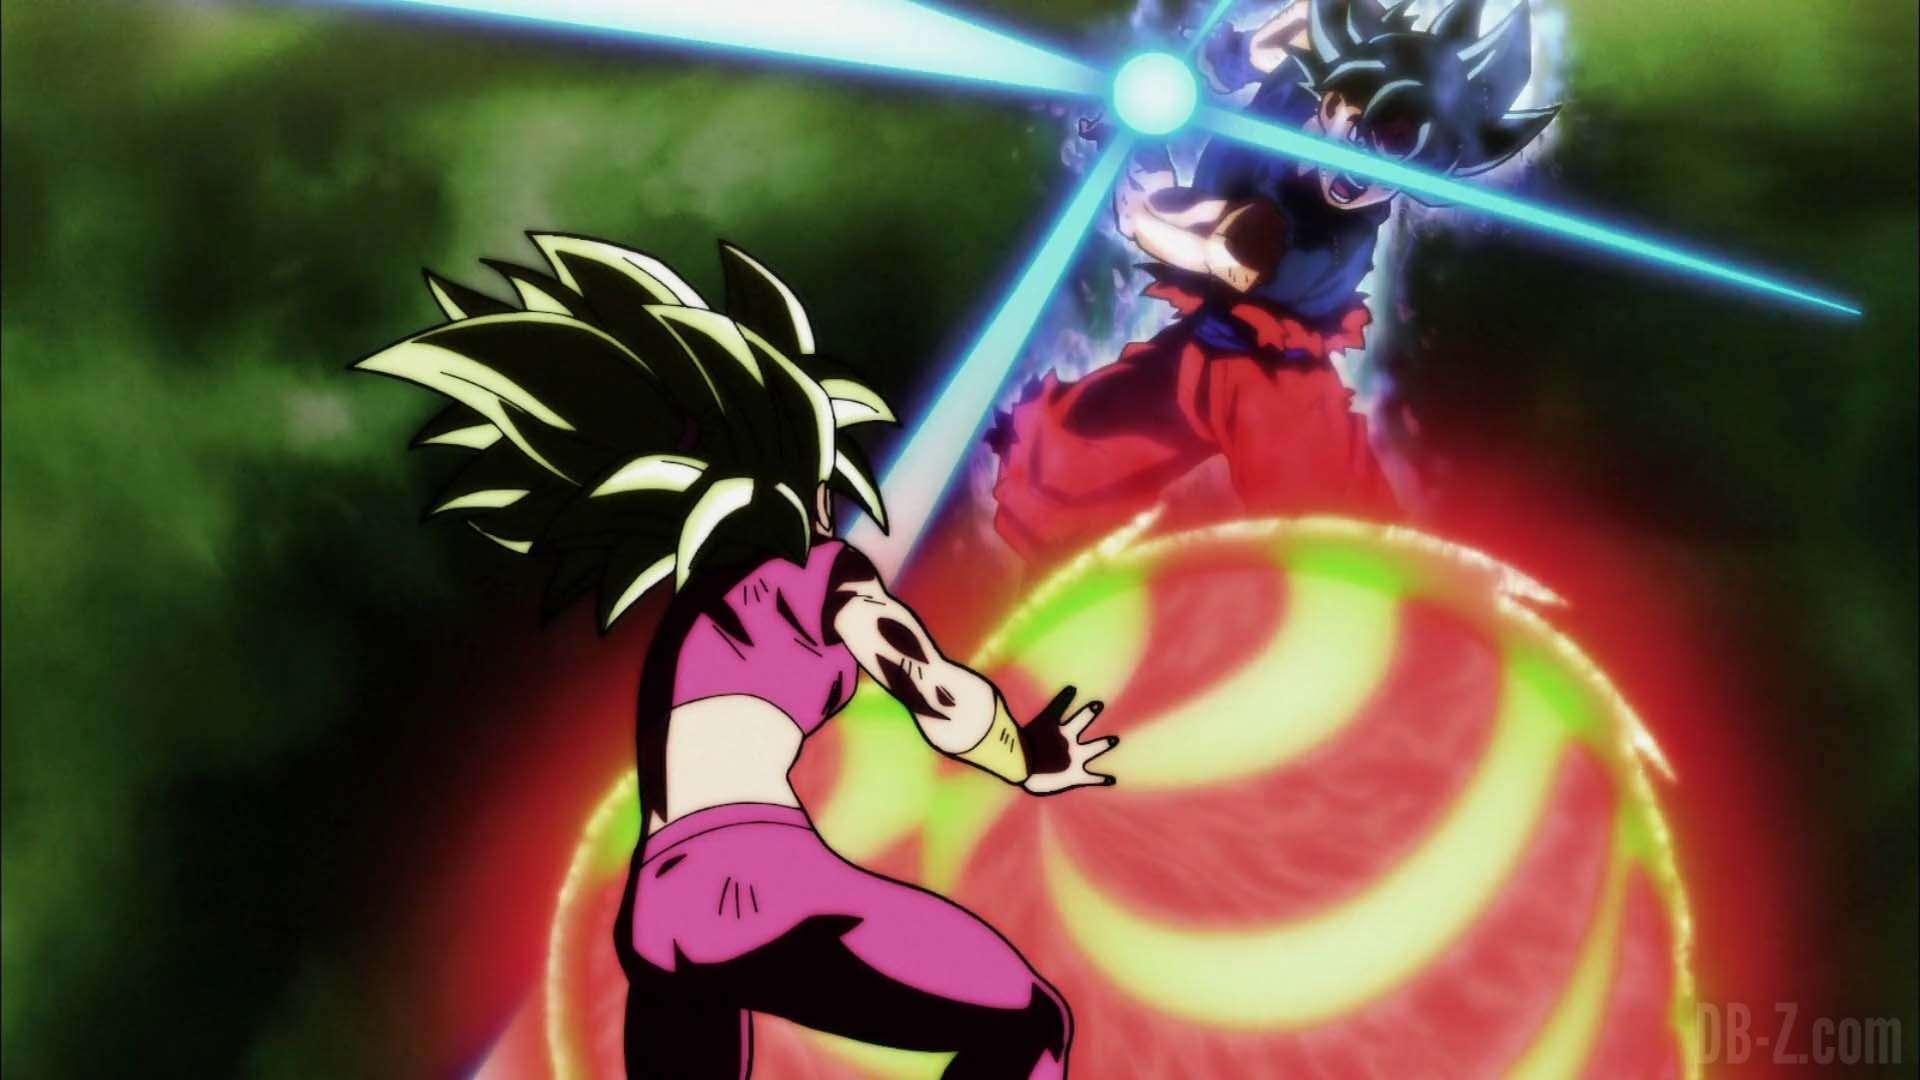 Kefla vẫn kém Goku 1 bậc!